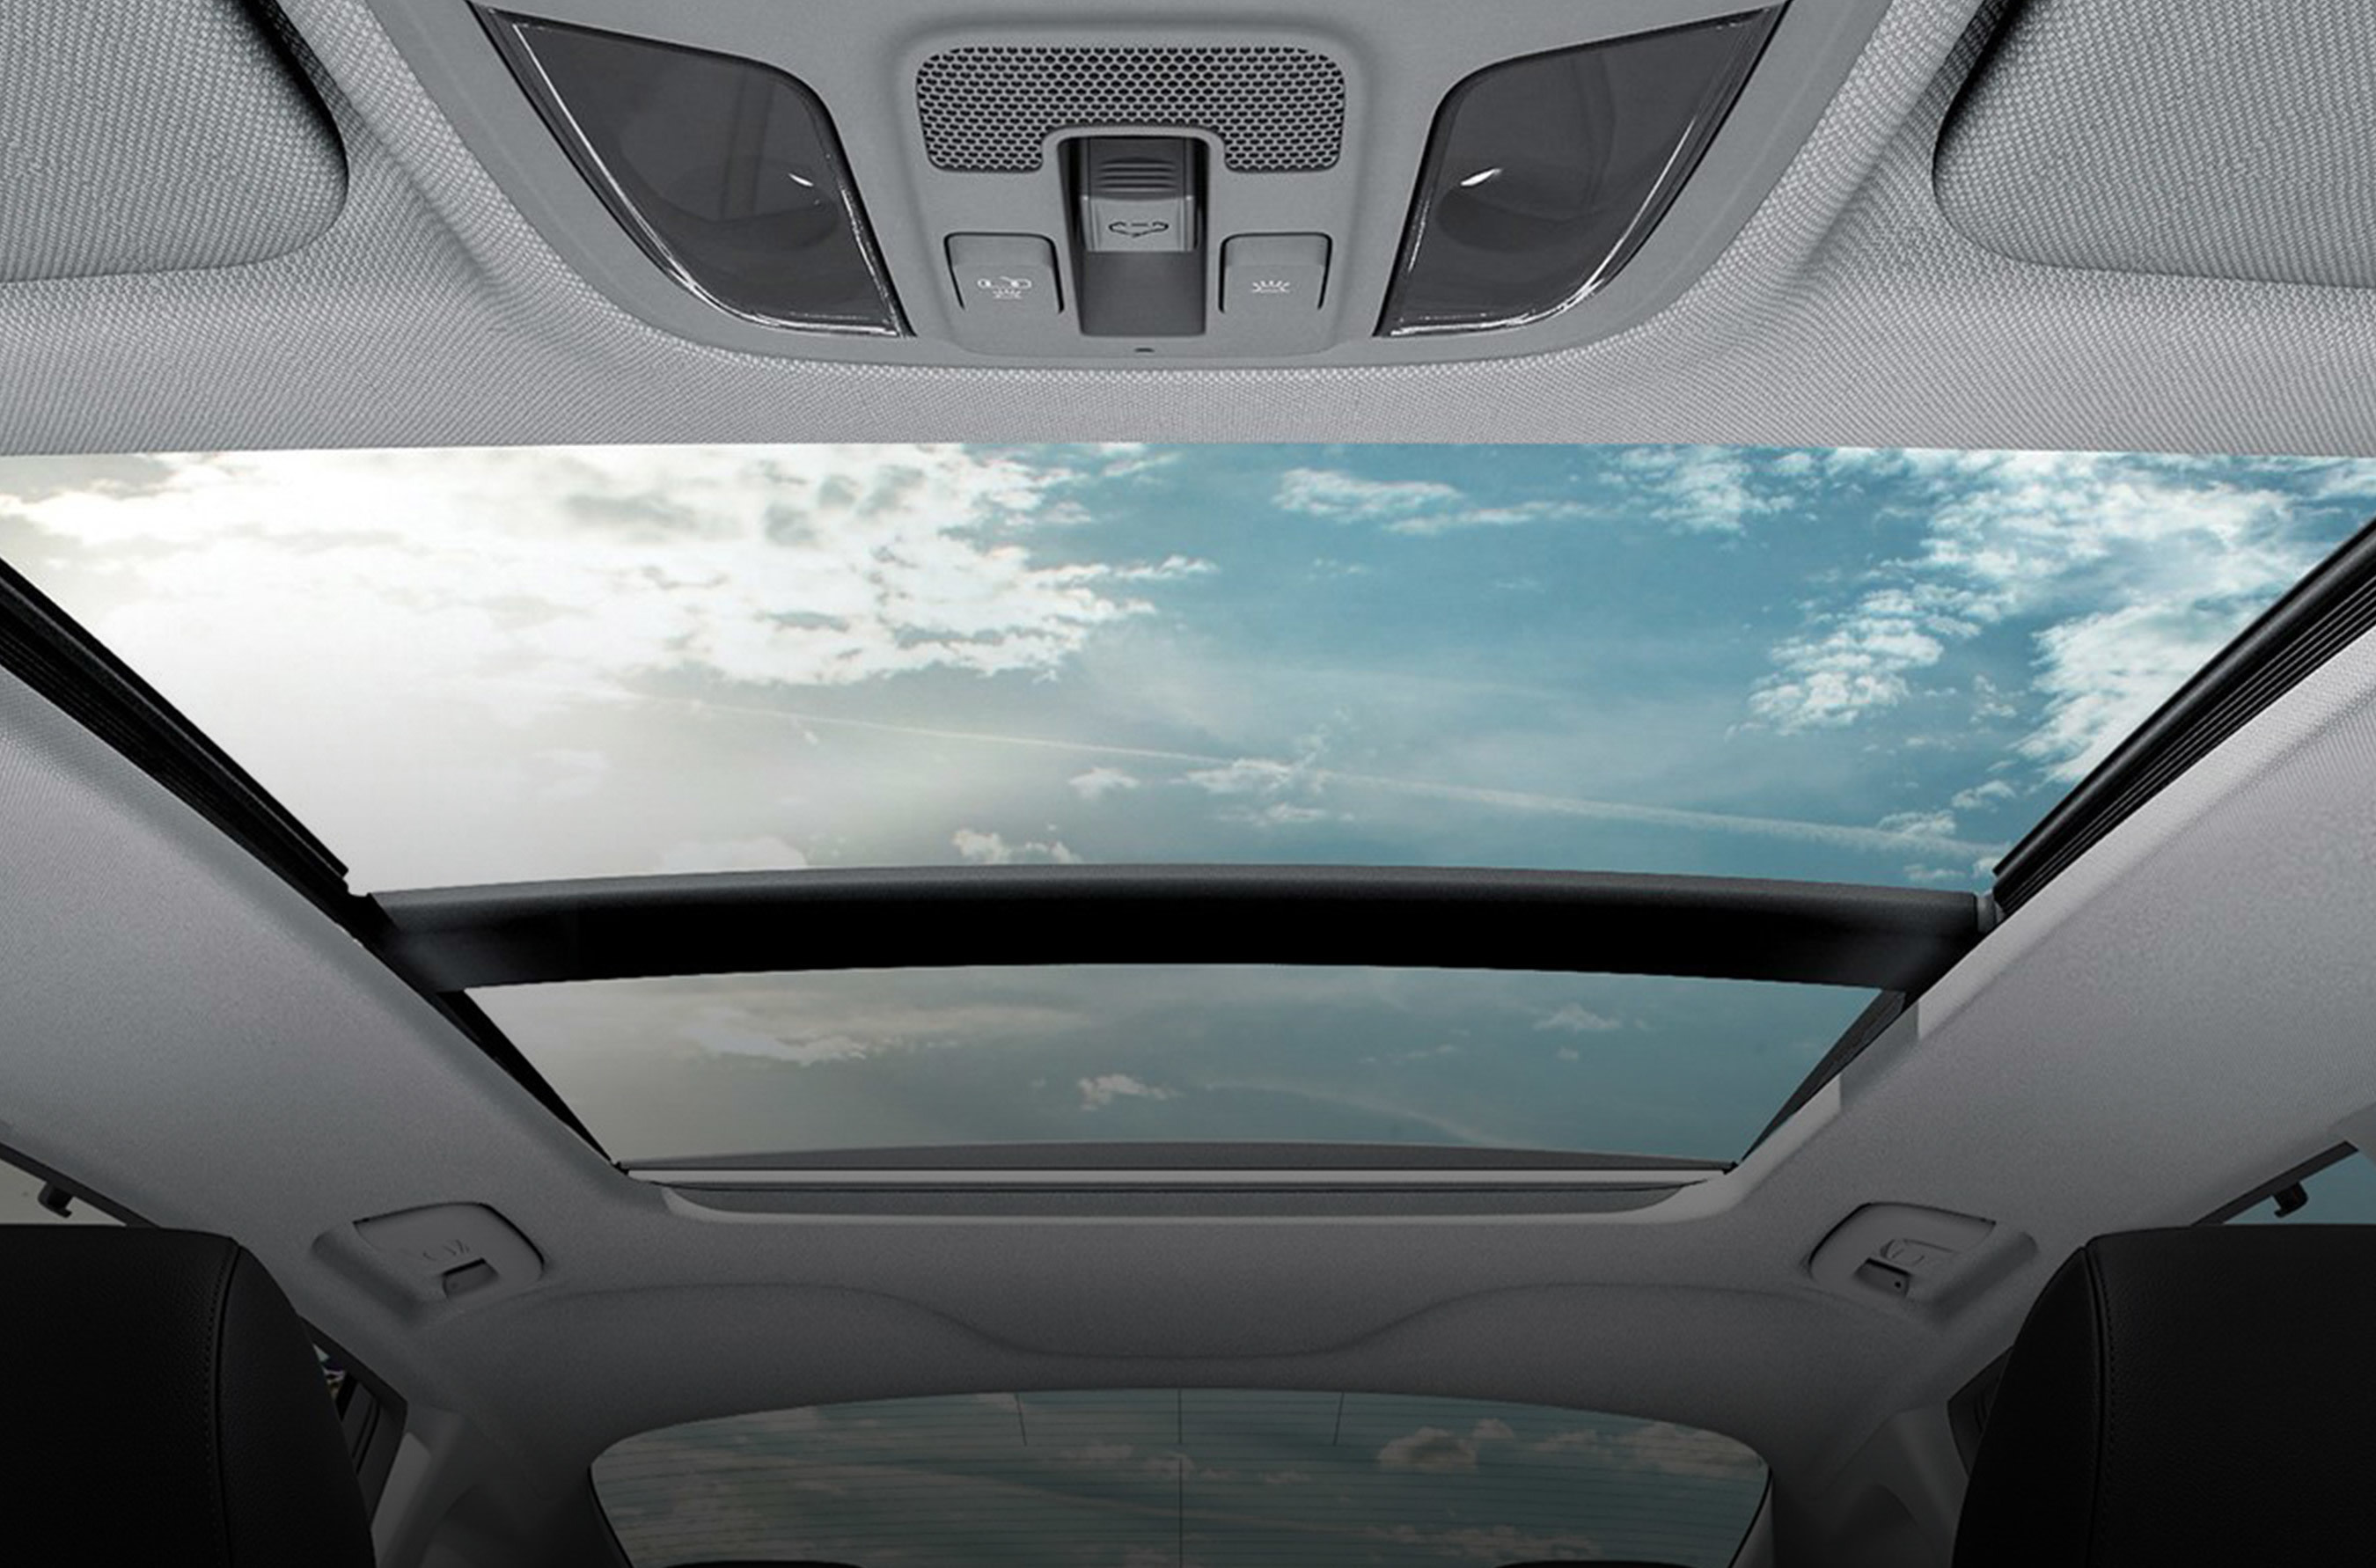 Enjoy the Breeze as You Cruise in the 2020 Kia Optima!